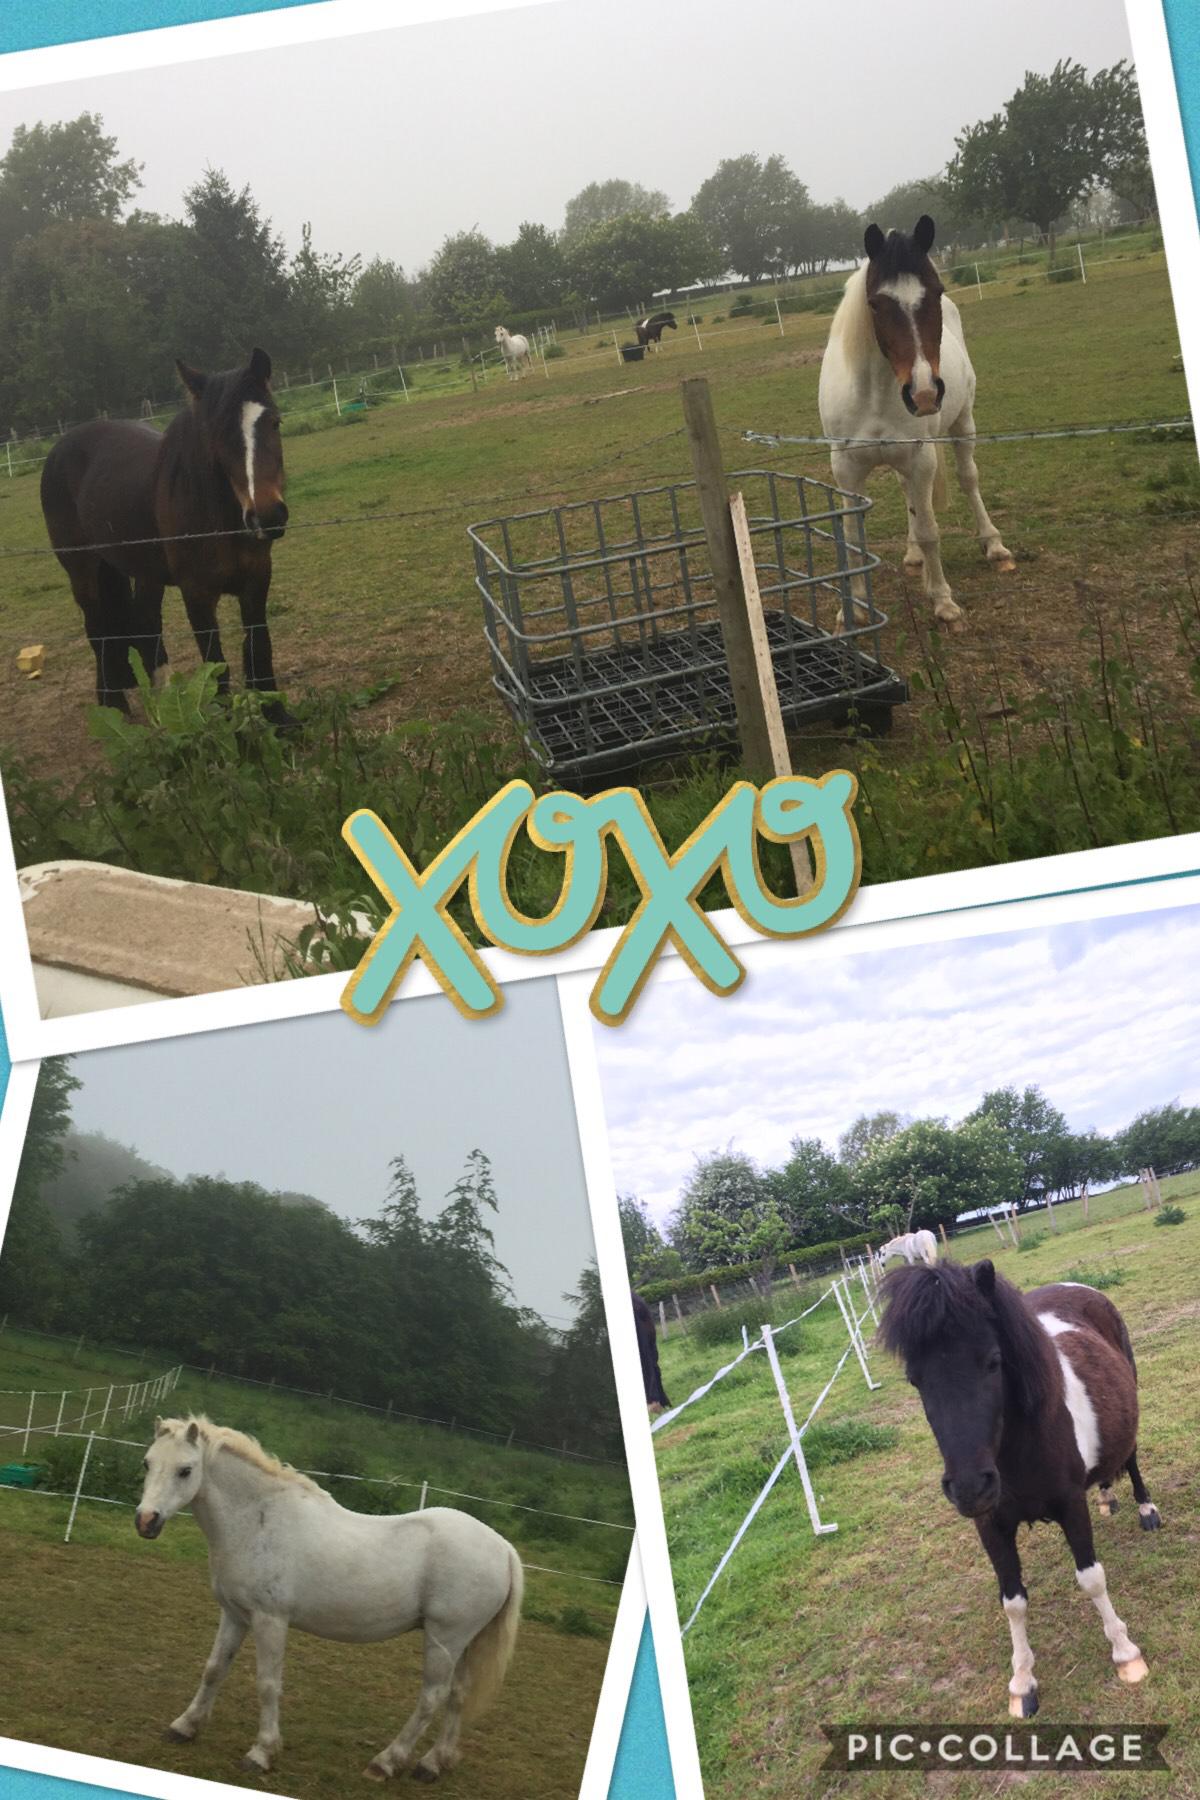 # ponies 4 life ❤️❤️❤️